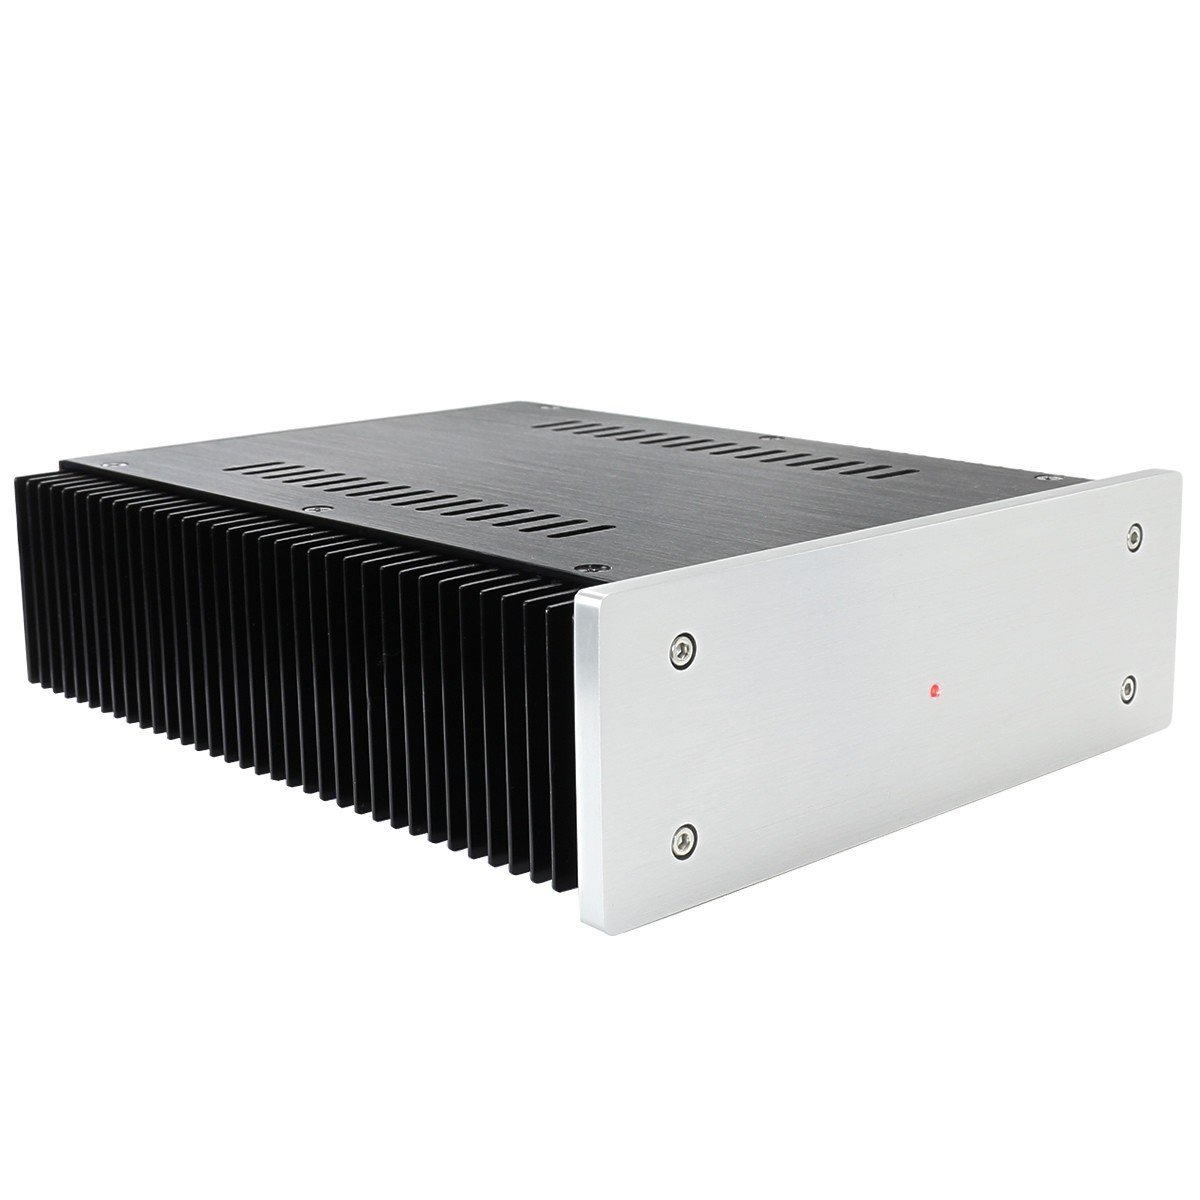 HiFi Linear stabilized power supply 12V + 5V 5A 200W NAS / Freebox / Squeezebox